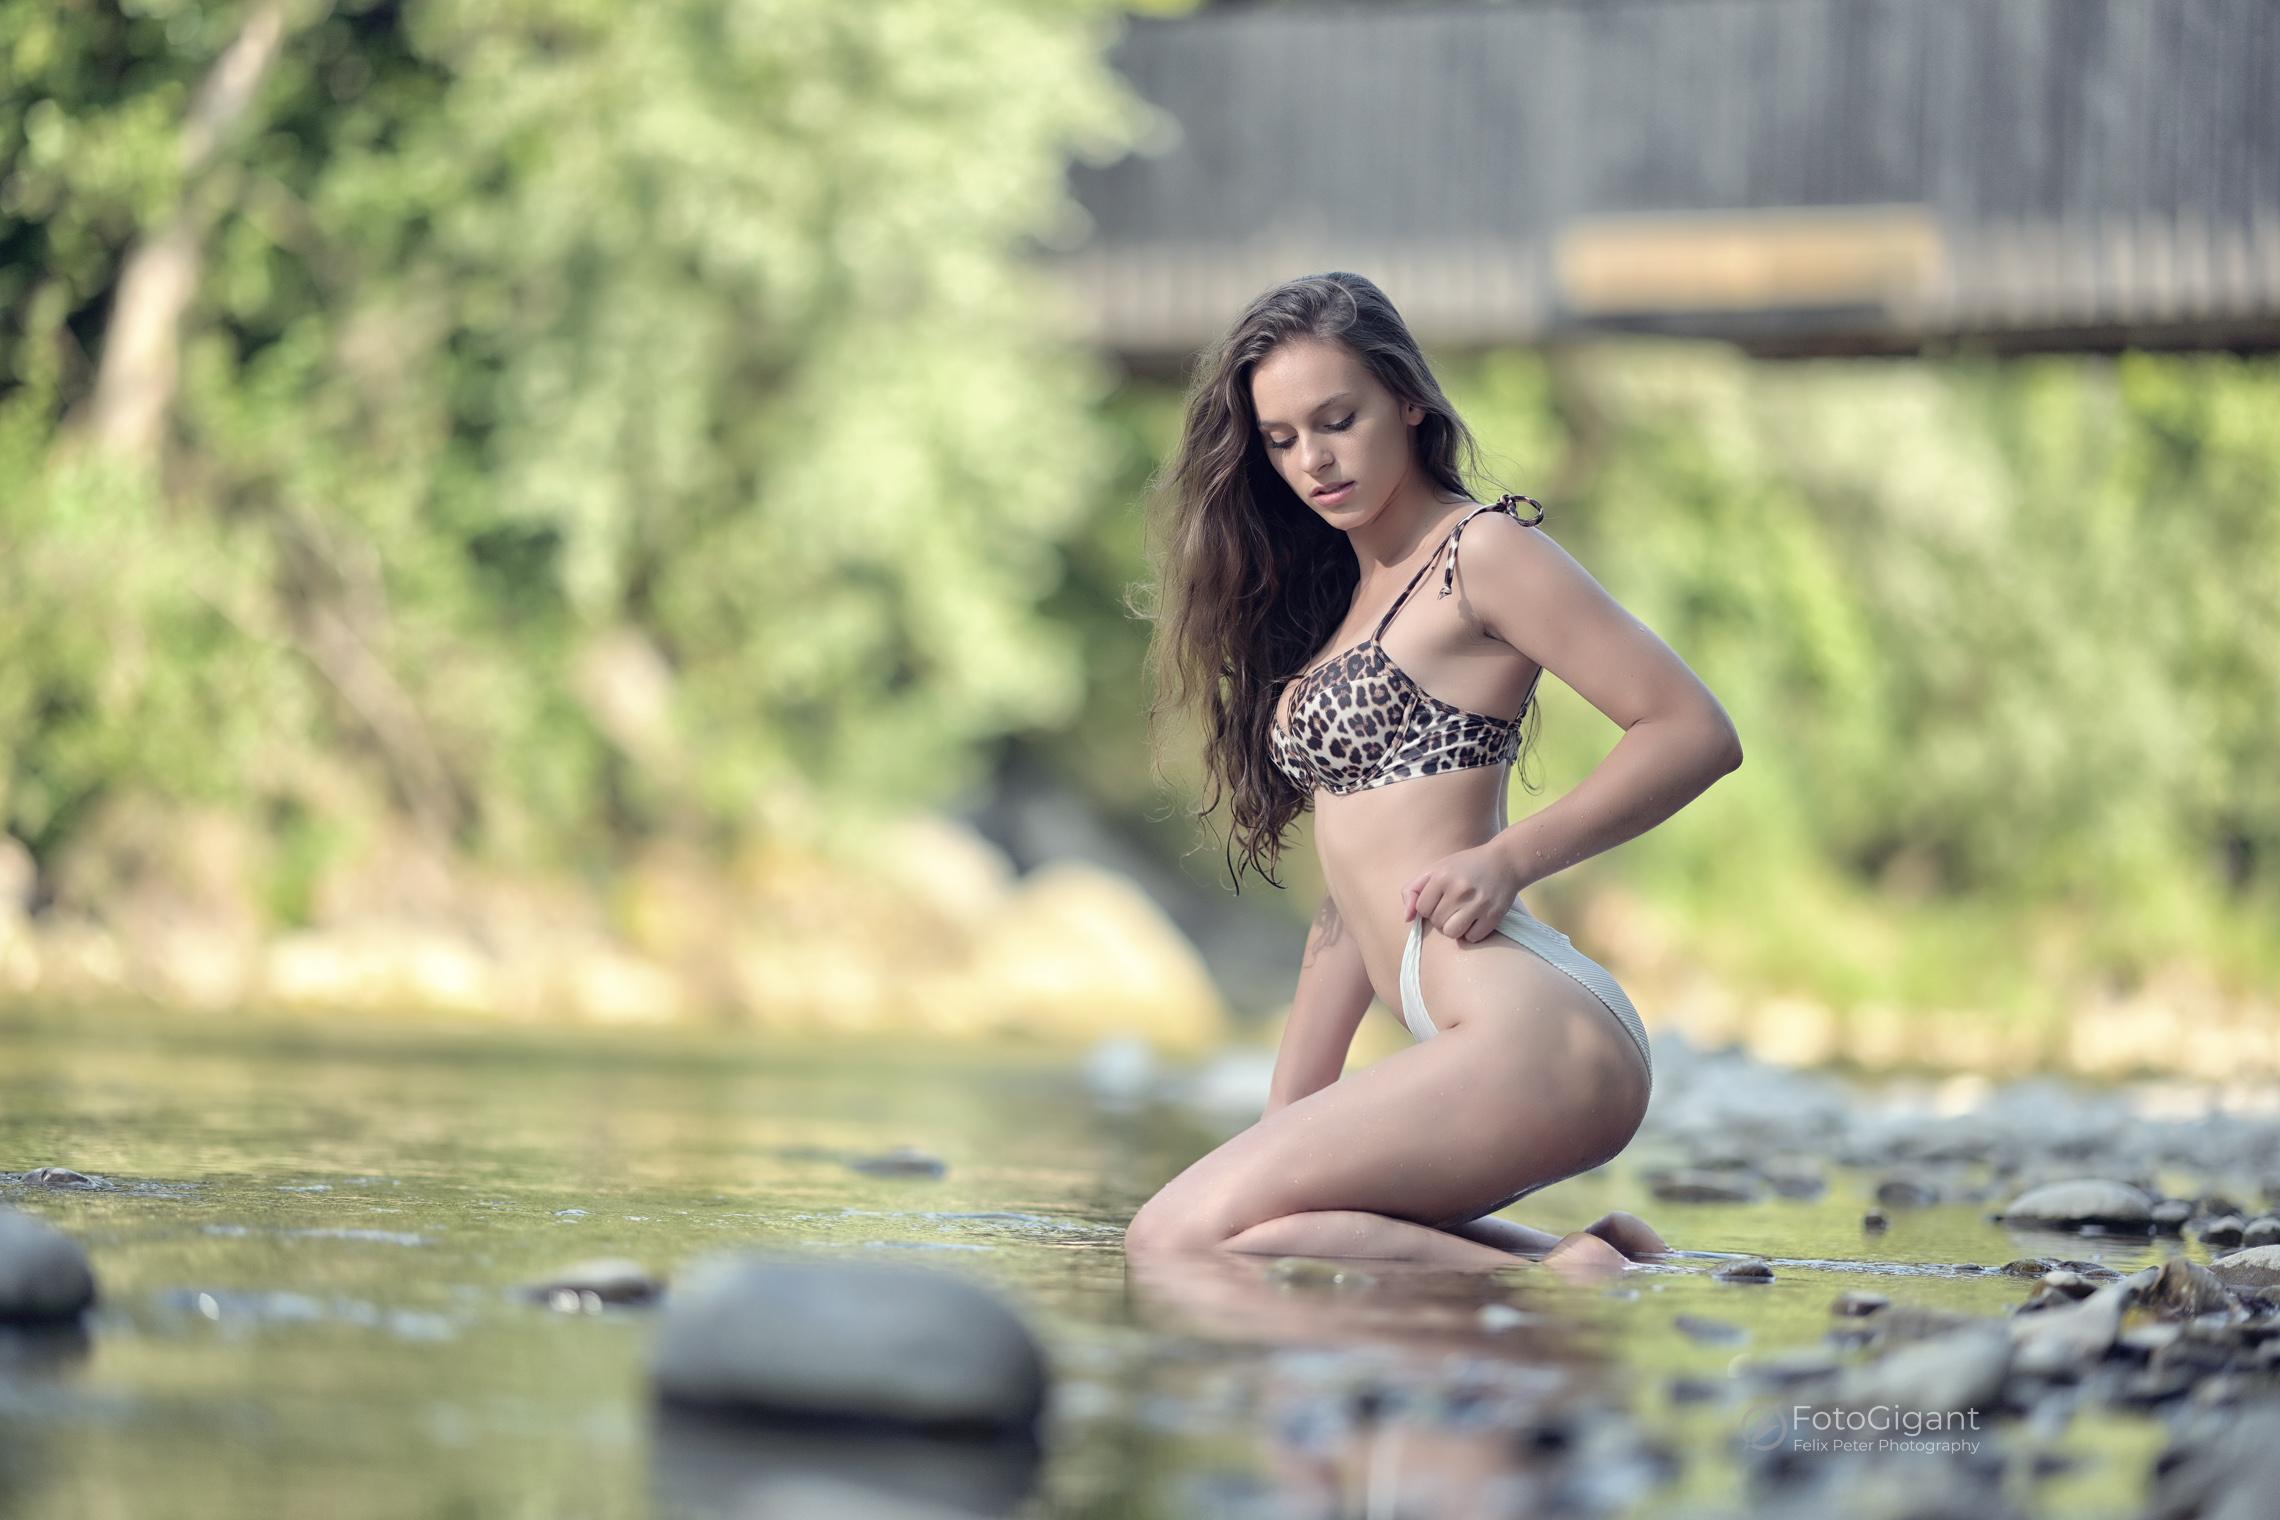 Bikini_Fashionphotography_FelixPeter_18.jpg